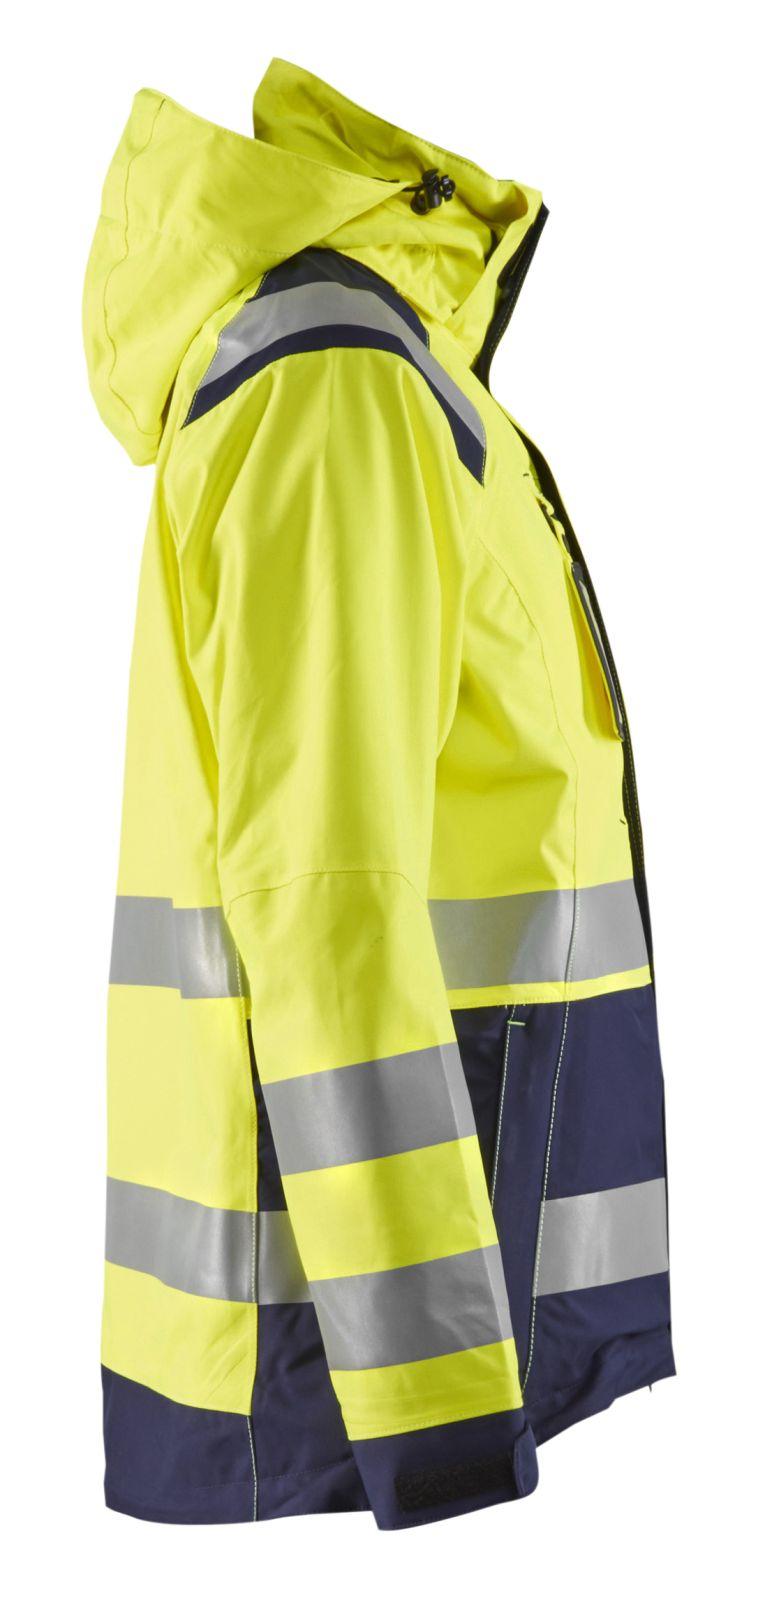 Blaklader Dames regenjacks 49041987 High Vis geel-marineblauw(3389)